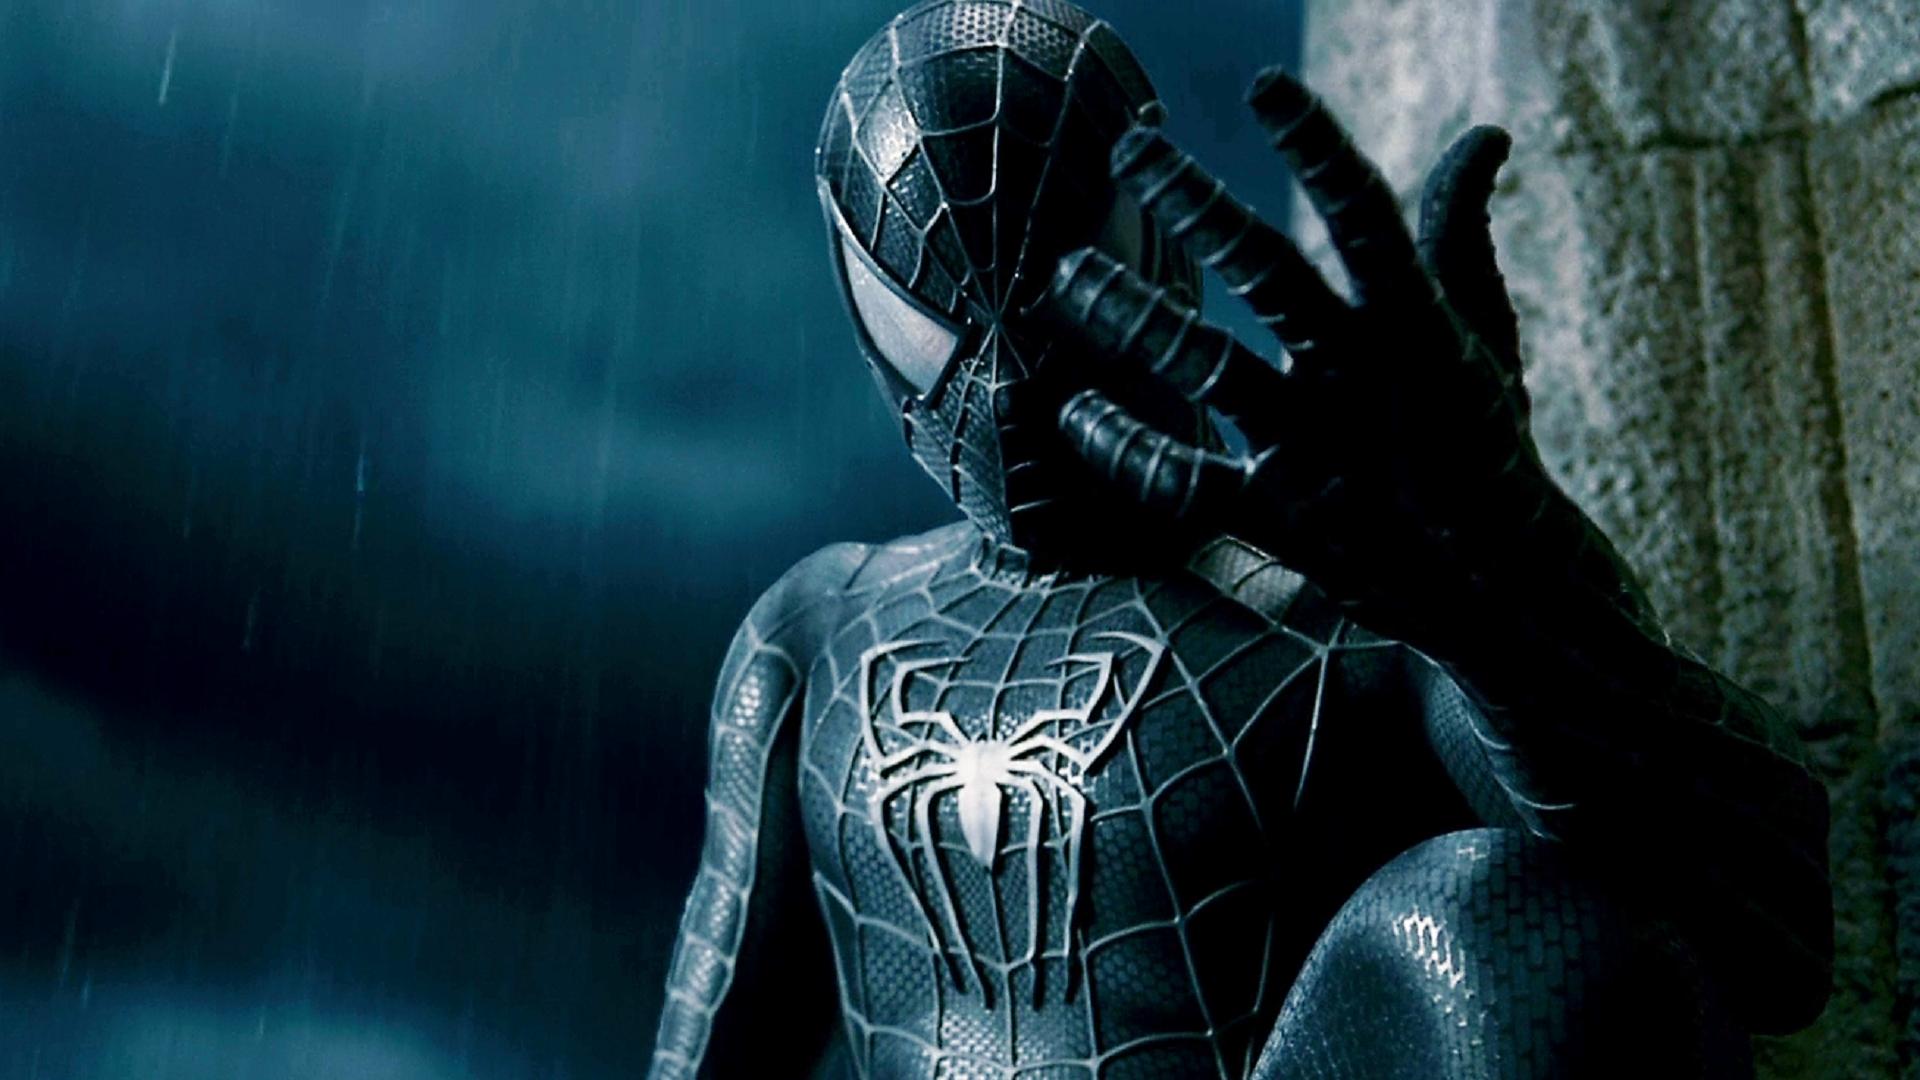 Spider Man 3 Hd Wallpaper Background Image 1920x1080 Id